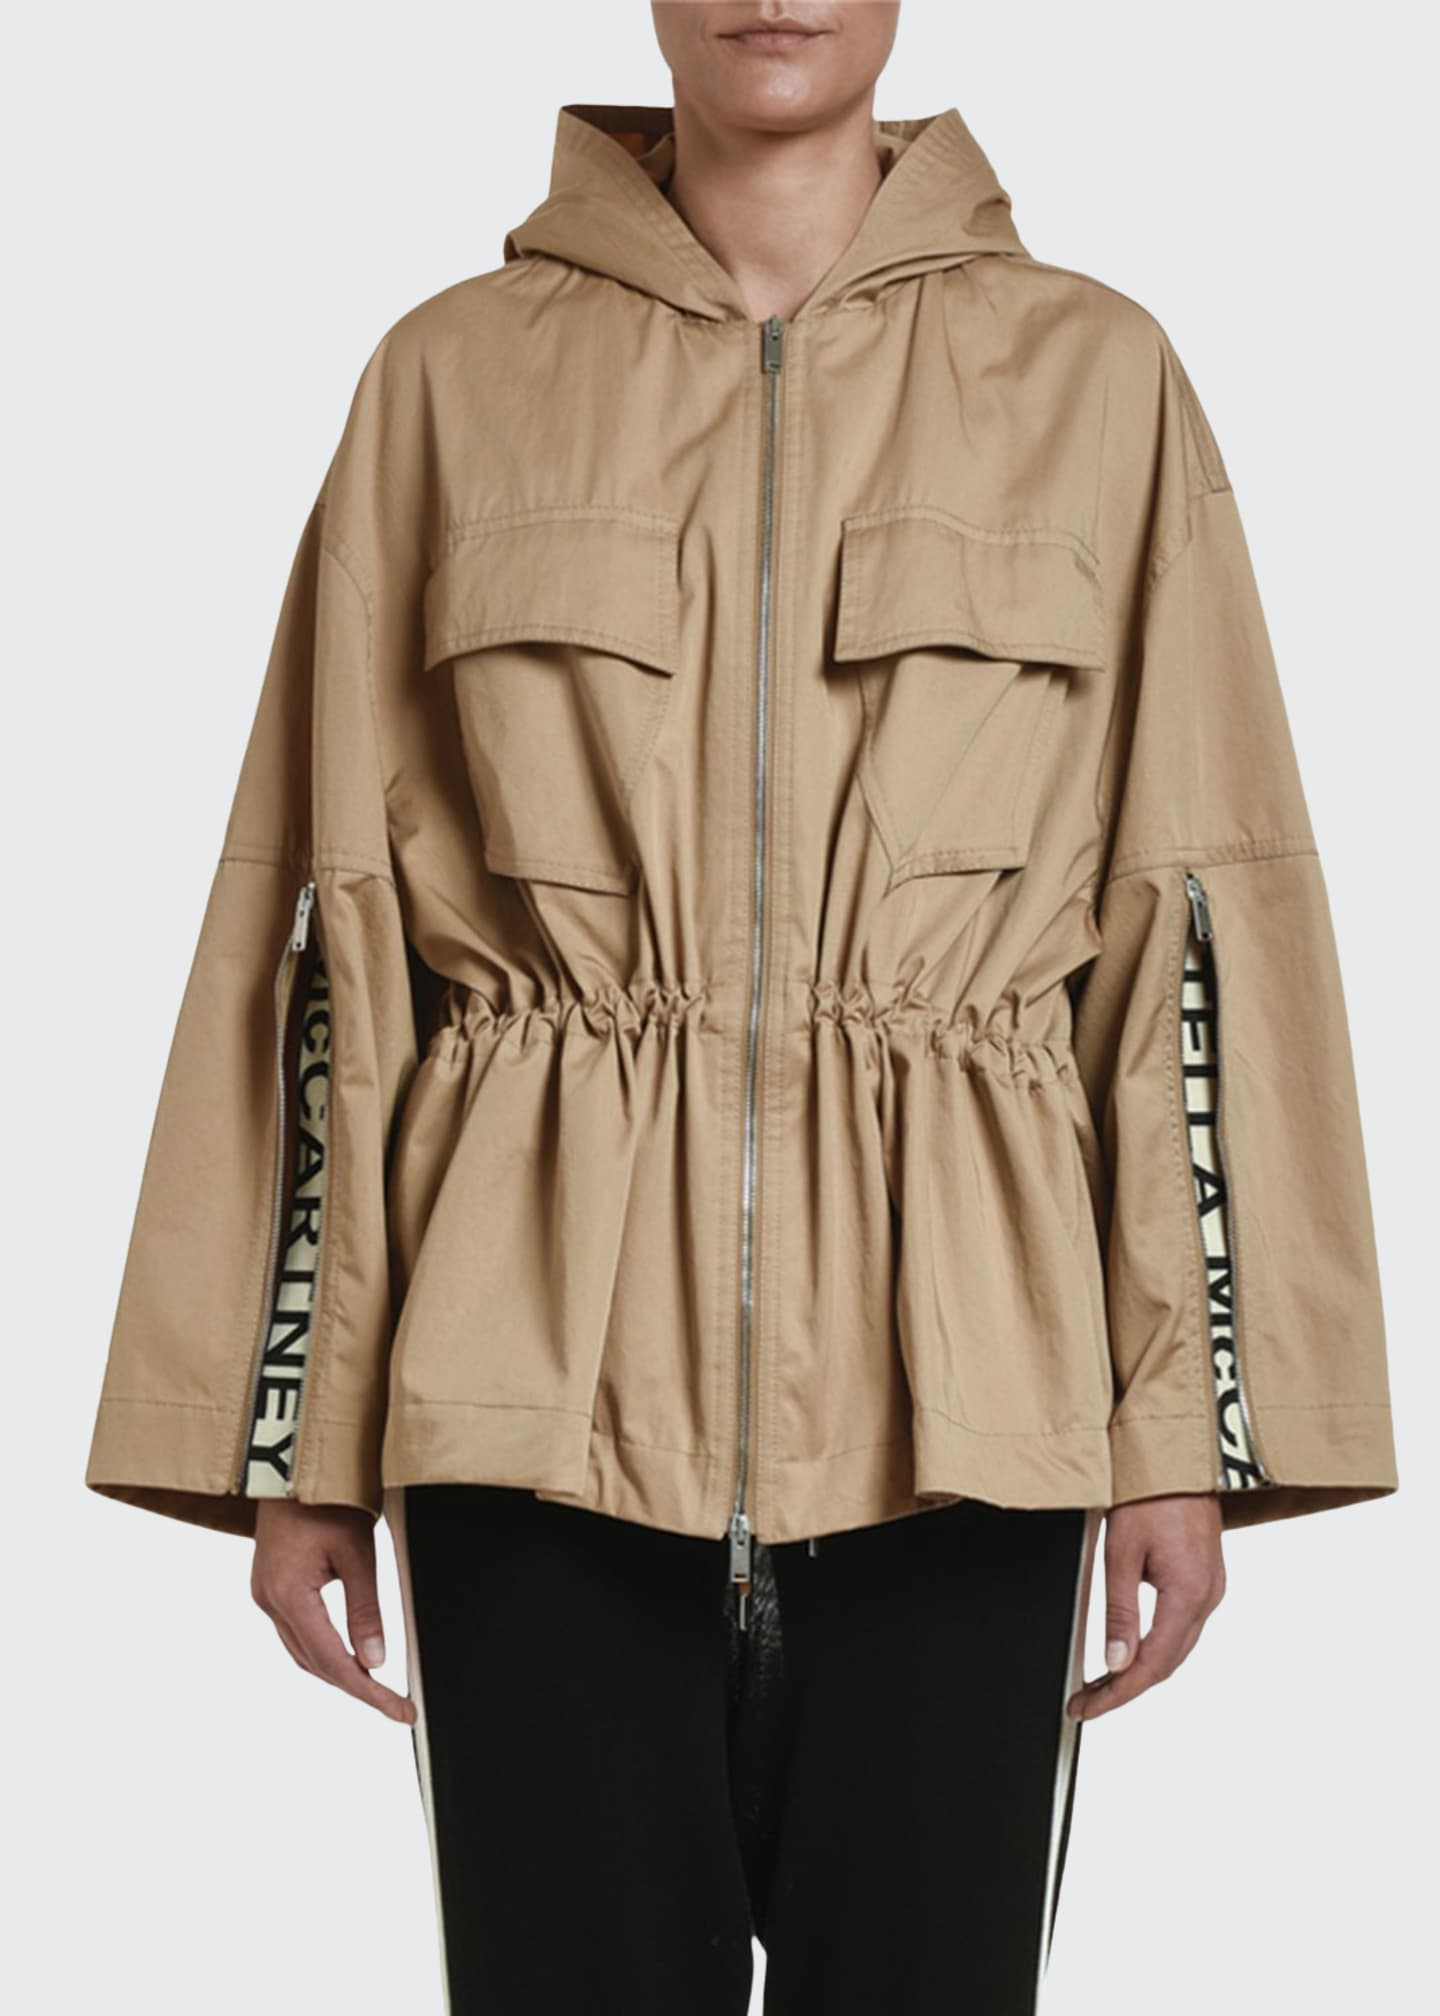 Stella McCartney Drawstring-Waist Cropped Trench Jacket